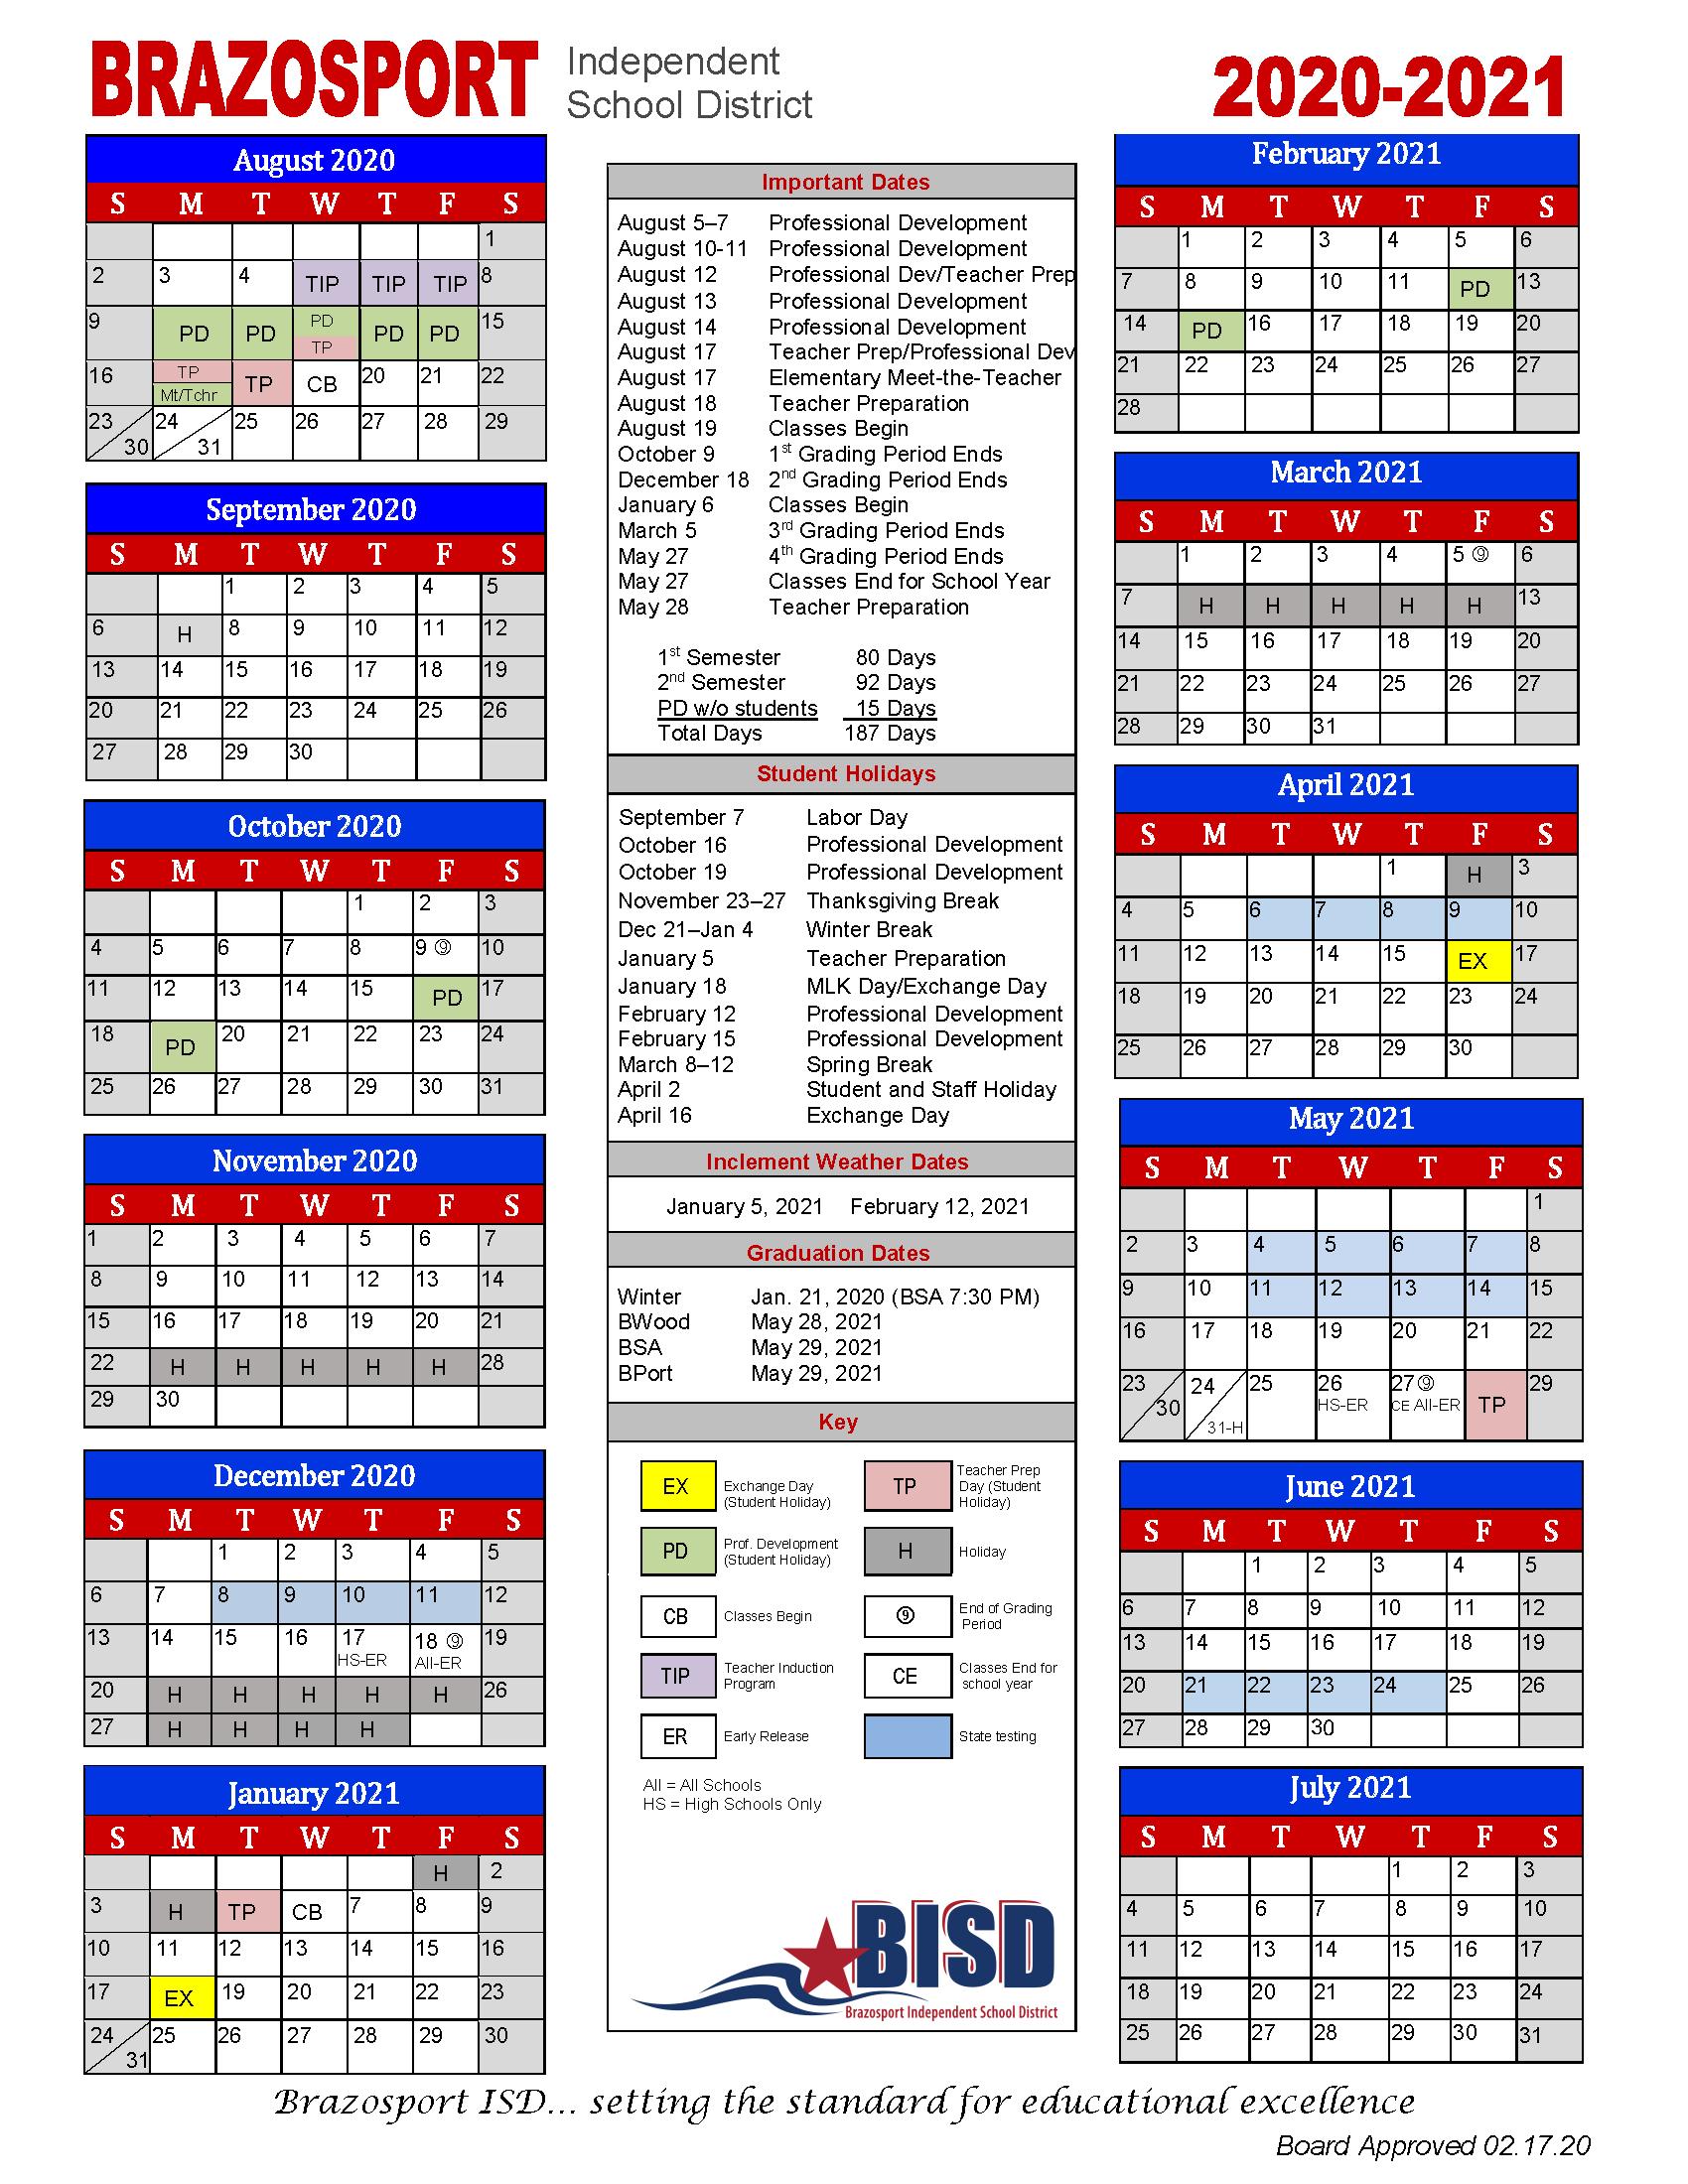 Board Approves 2020 2021 School Calendar – Brazosport In Brownsville Isd Academic Calendar